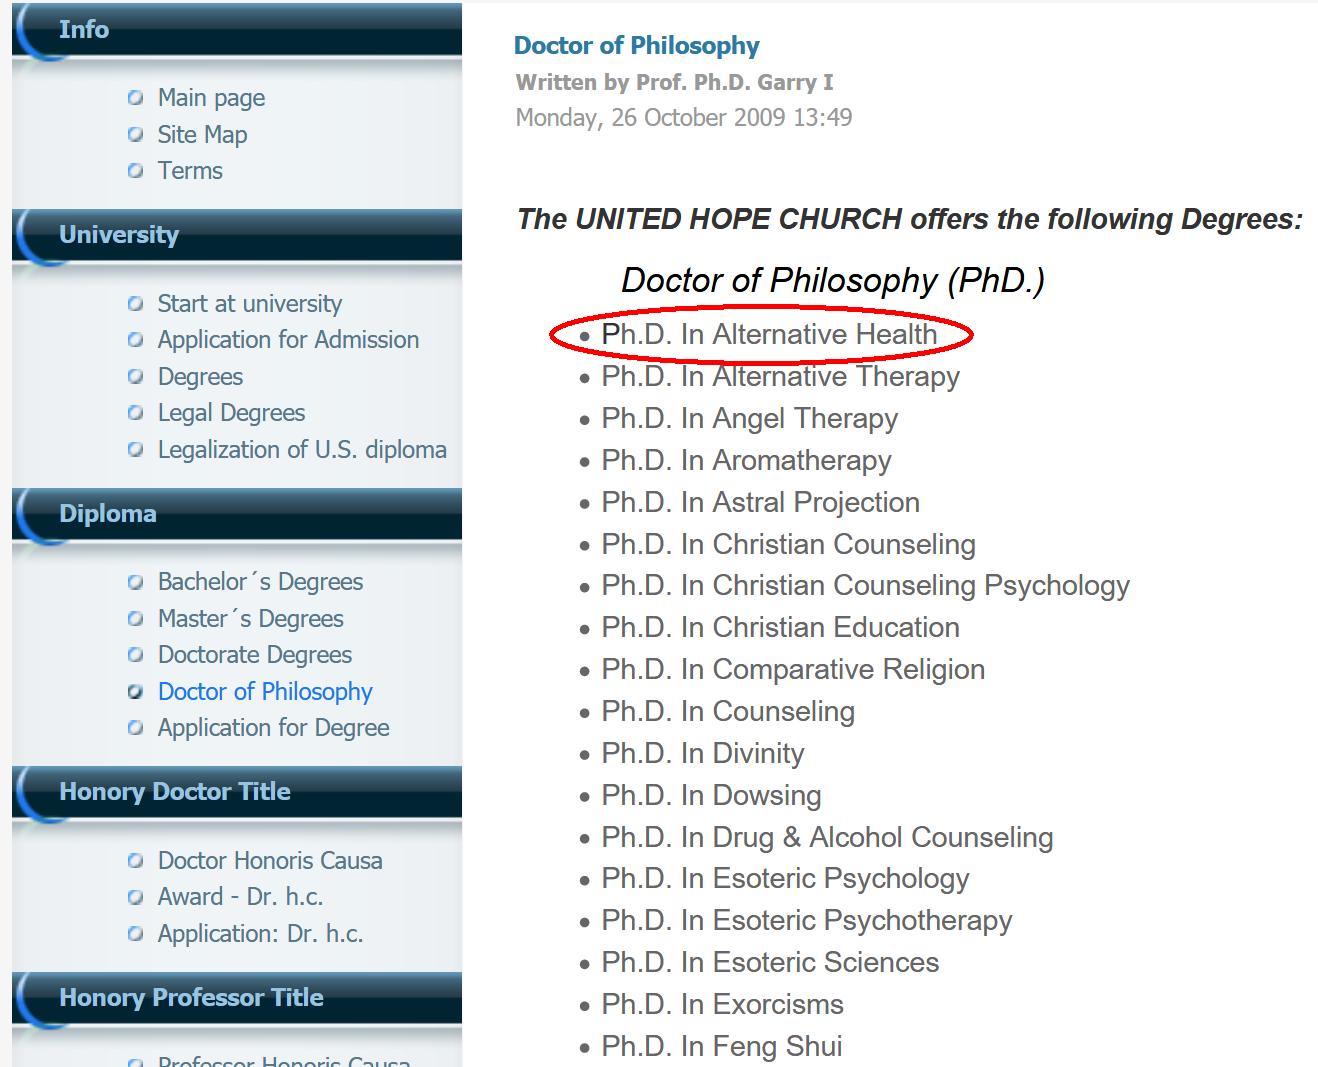 "8. kép: A ""United Hope Church University""-től megvásárolható <a href='https://web.archive.org/web/20100408114153/http://unitedhopechurch.com/index.php?option=com_content&view=article&id=60&Itemid=69&lang=en'>Ph.D. oklevelek (lista részlete)</a>"